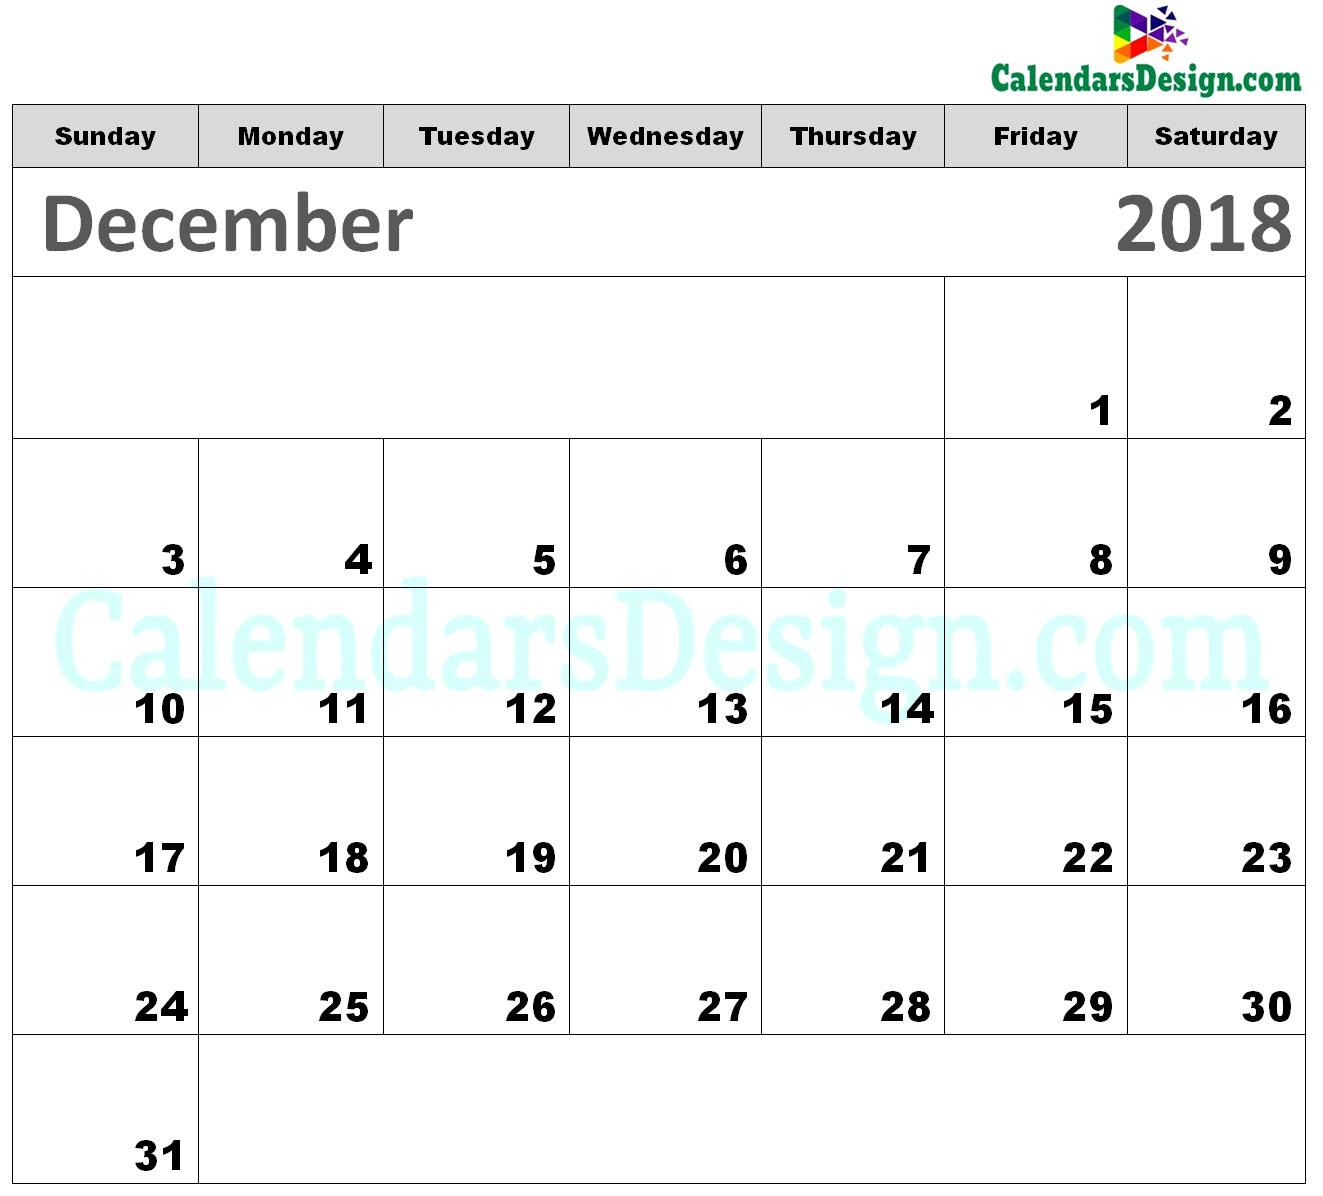 Printable Calendar for December 2018